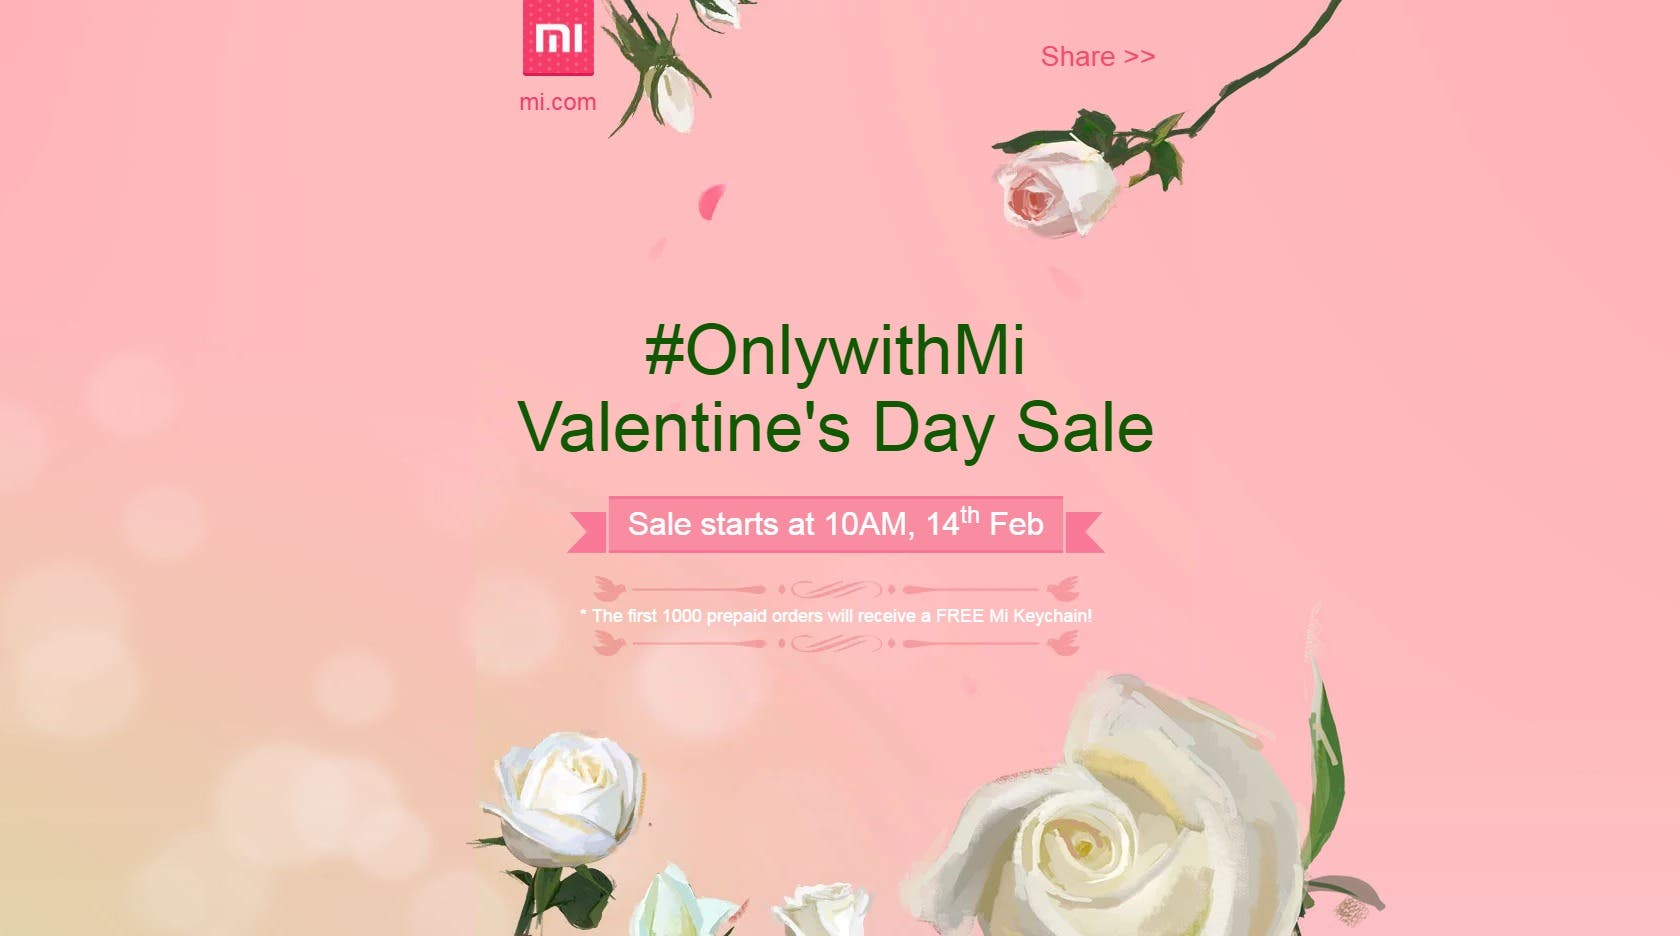 Valentine's Day Mi India